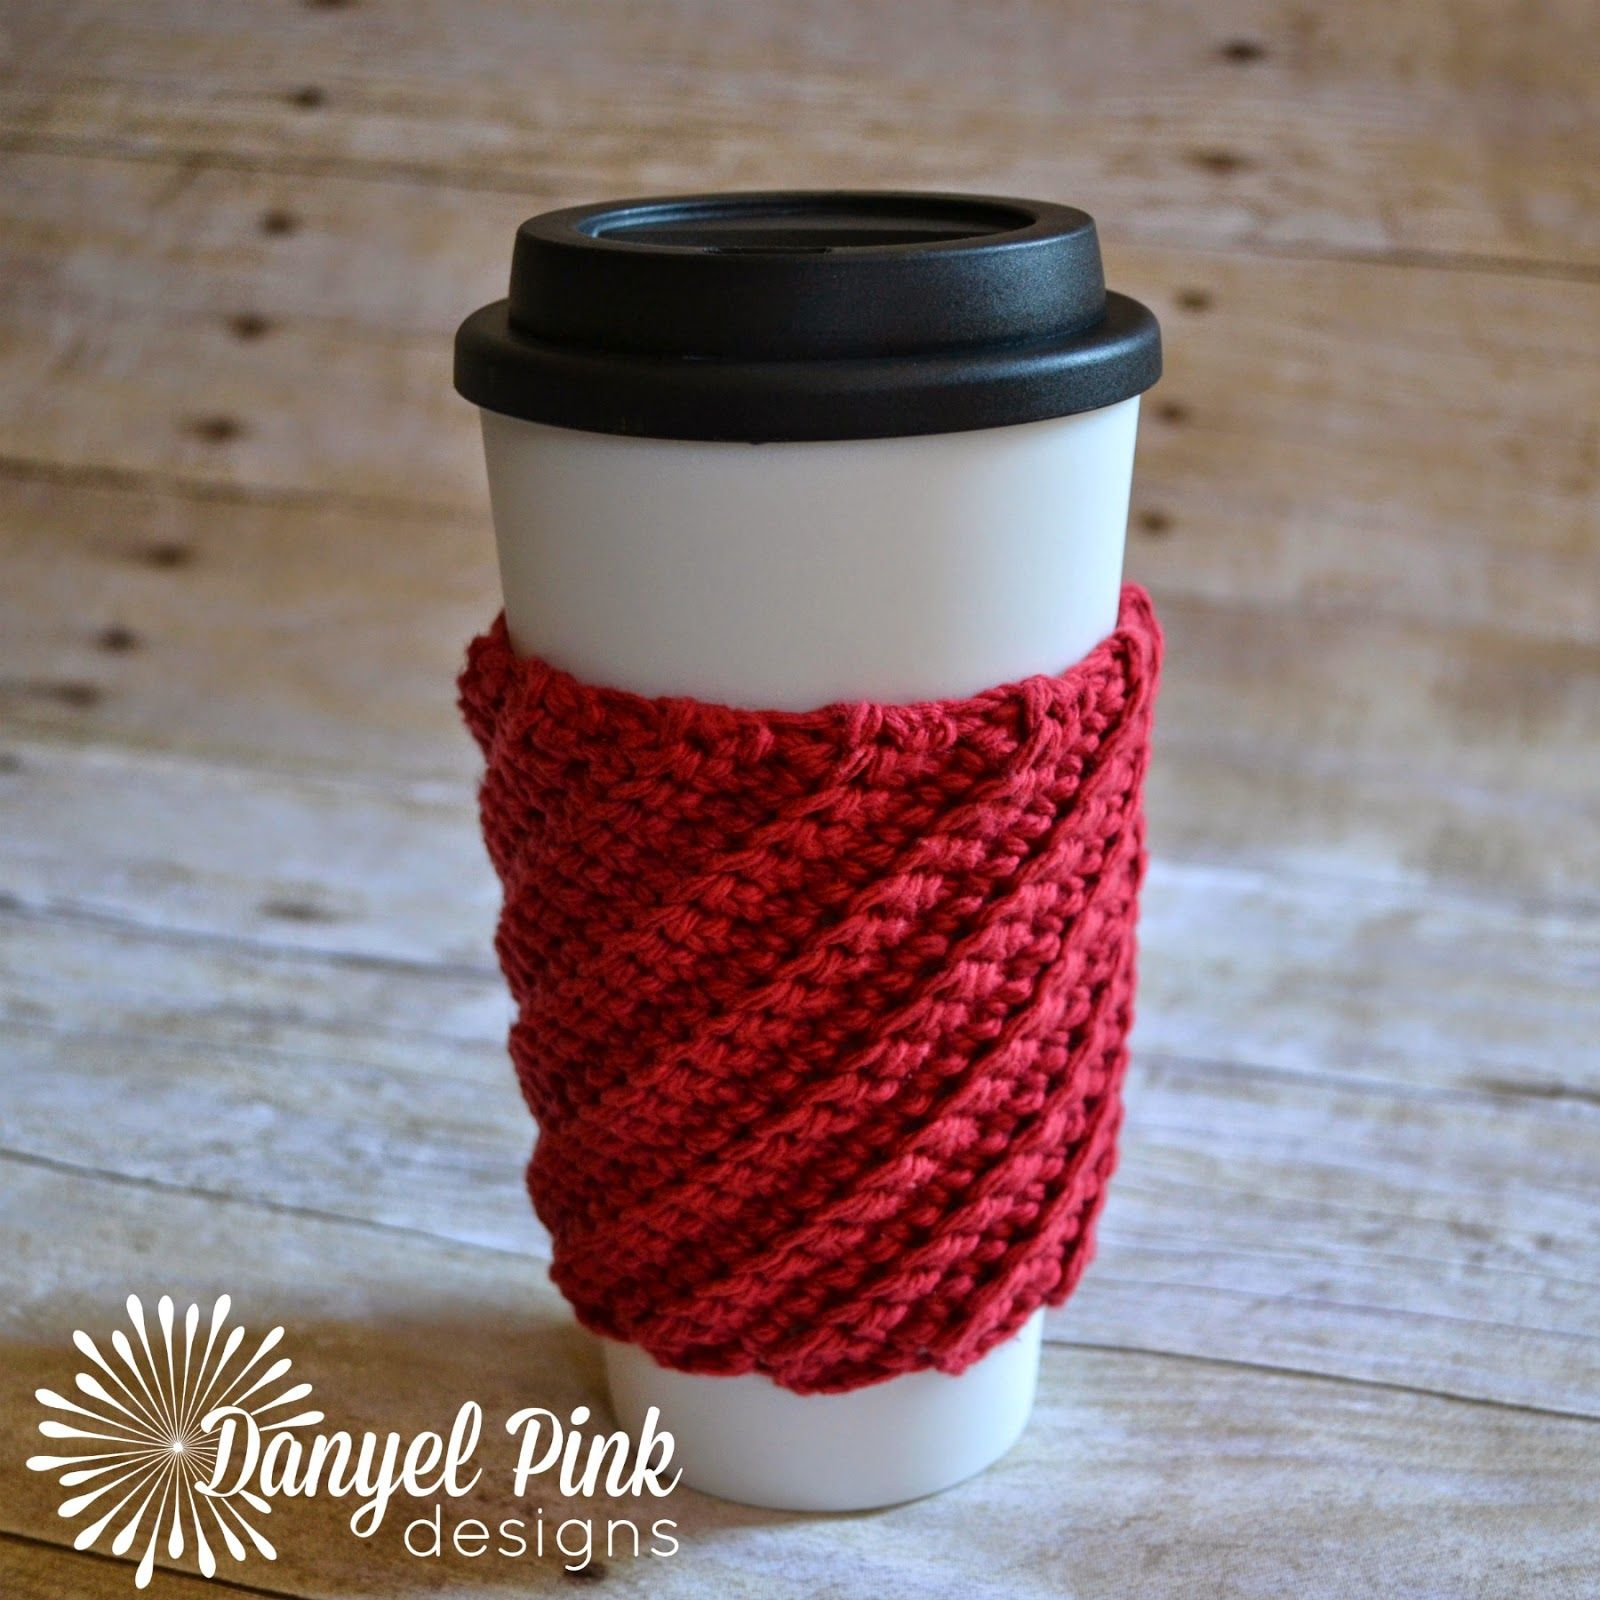 Danyel Pink Designs: CROCHET PATTERN - Crooked Coffee Cozy | Crochet ...